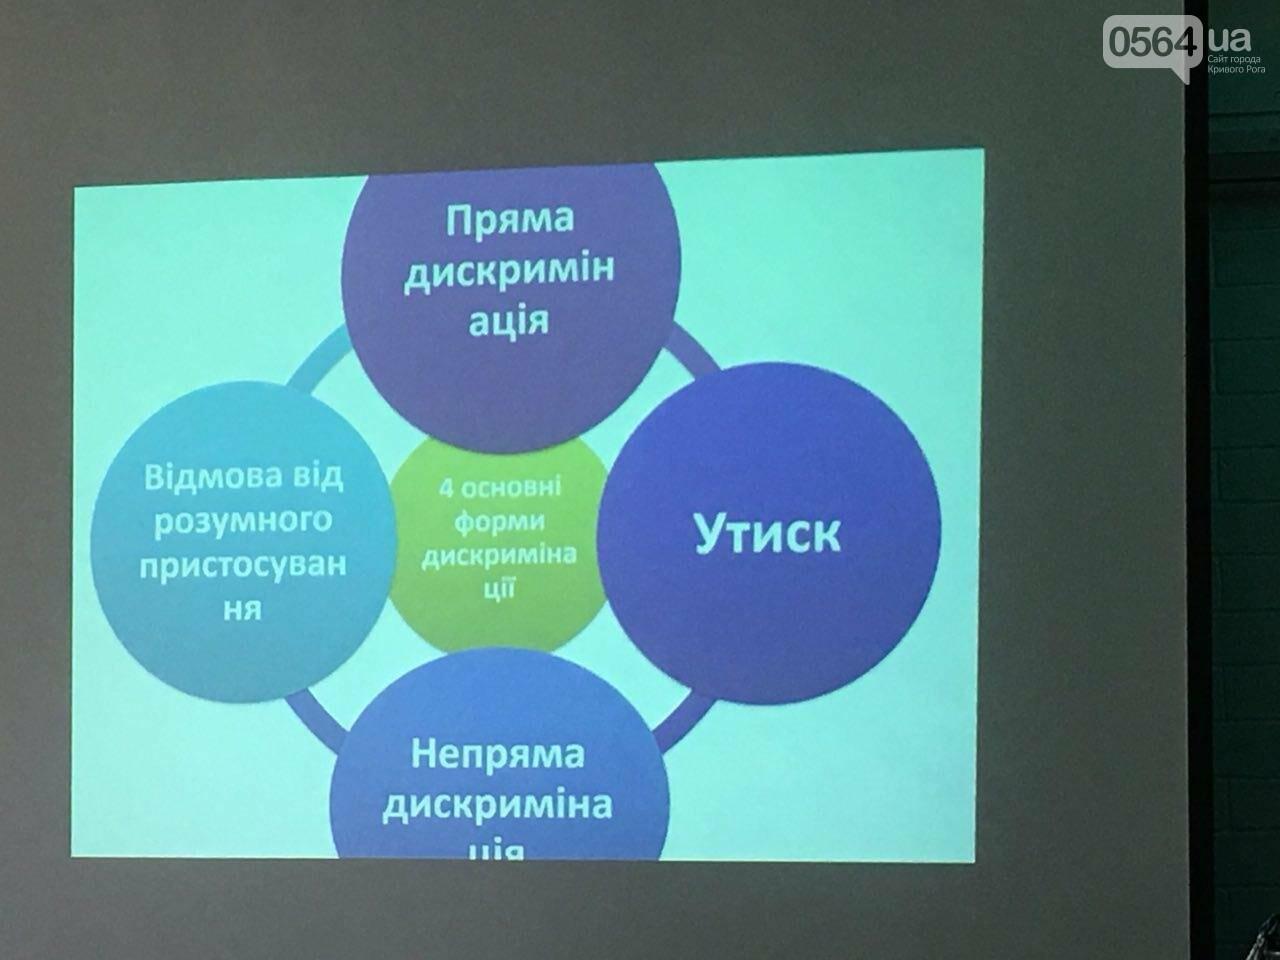 На тренинге о ВИЧ и медреформе криворожским журналистам рассказали о дискриминации и стереотипах, - ФОТО , фото-21